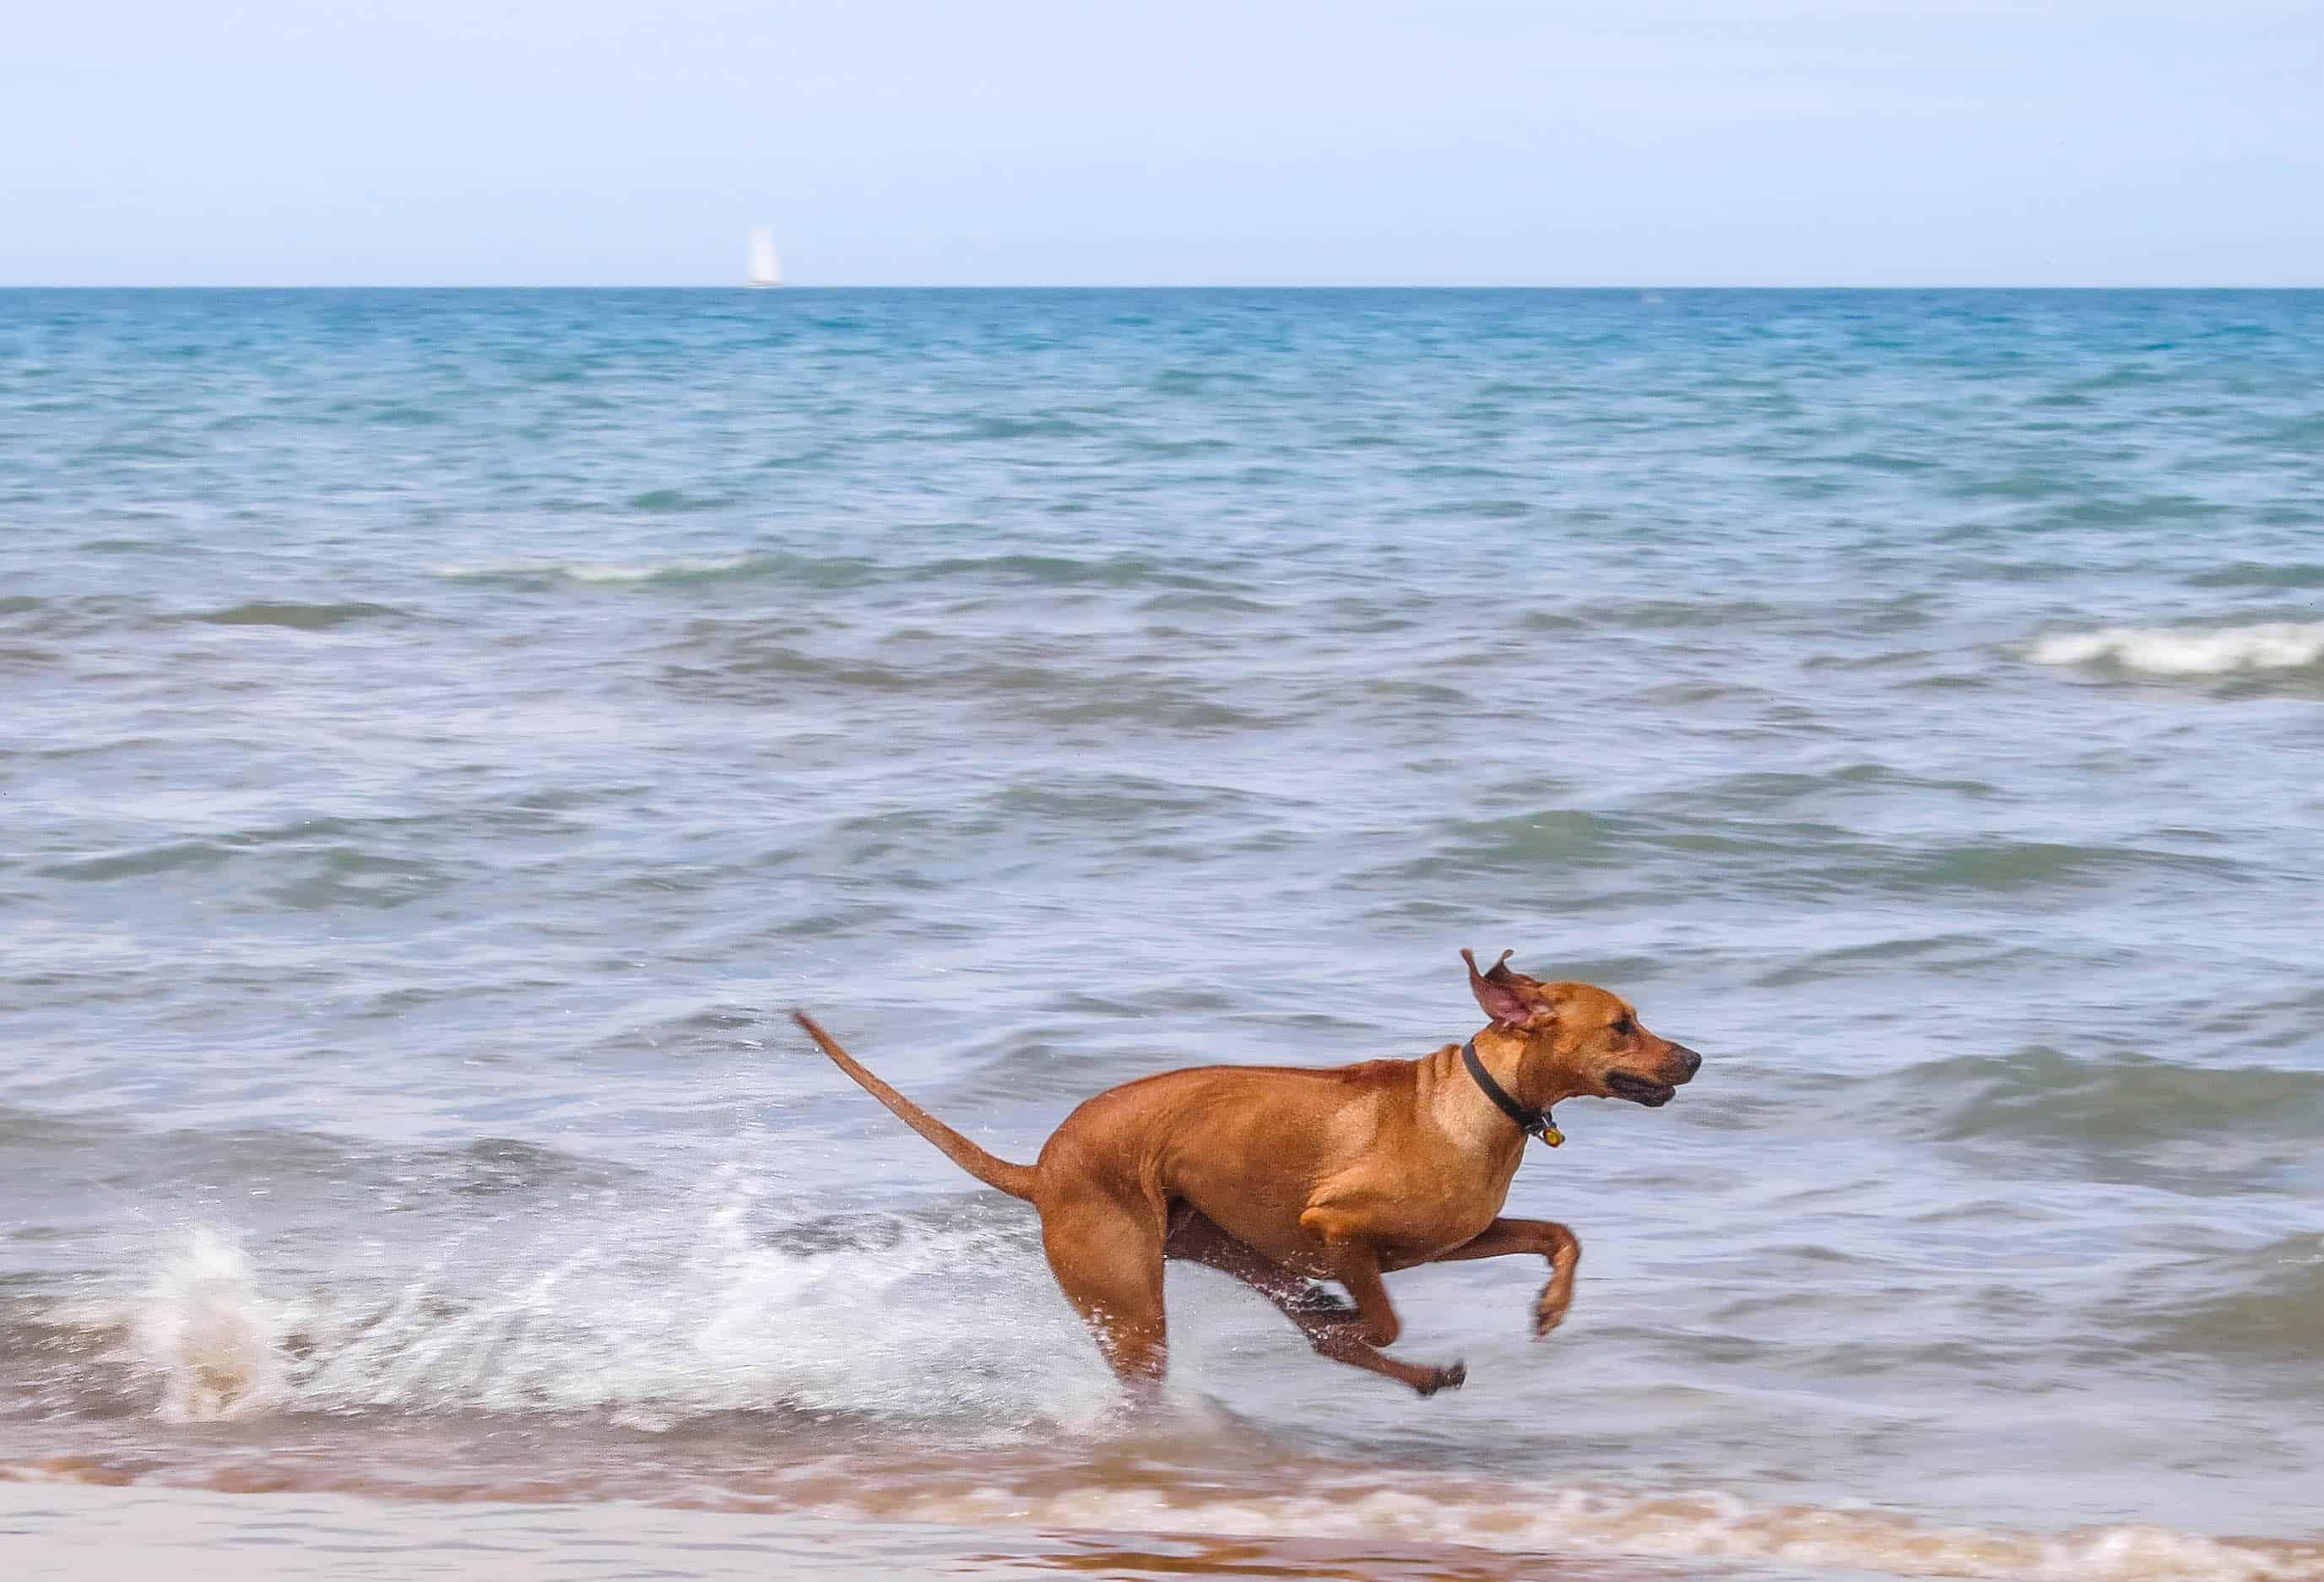 Rhodesian Ridgeback, rhodesian ridgeback photos, pet adventure, dog blog, marking our territory, petcentric